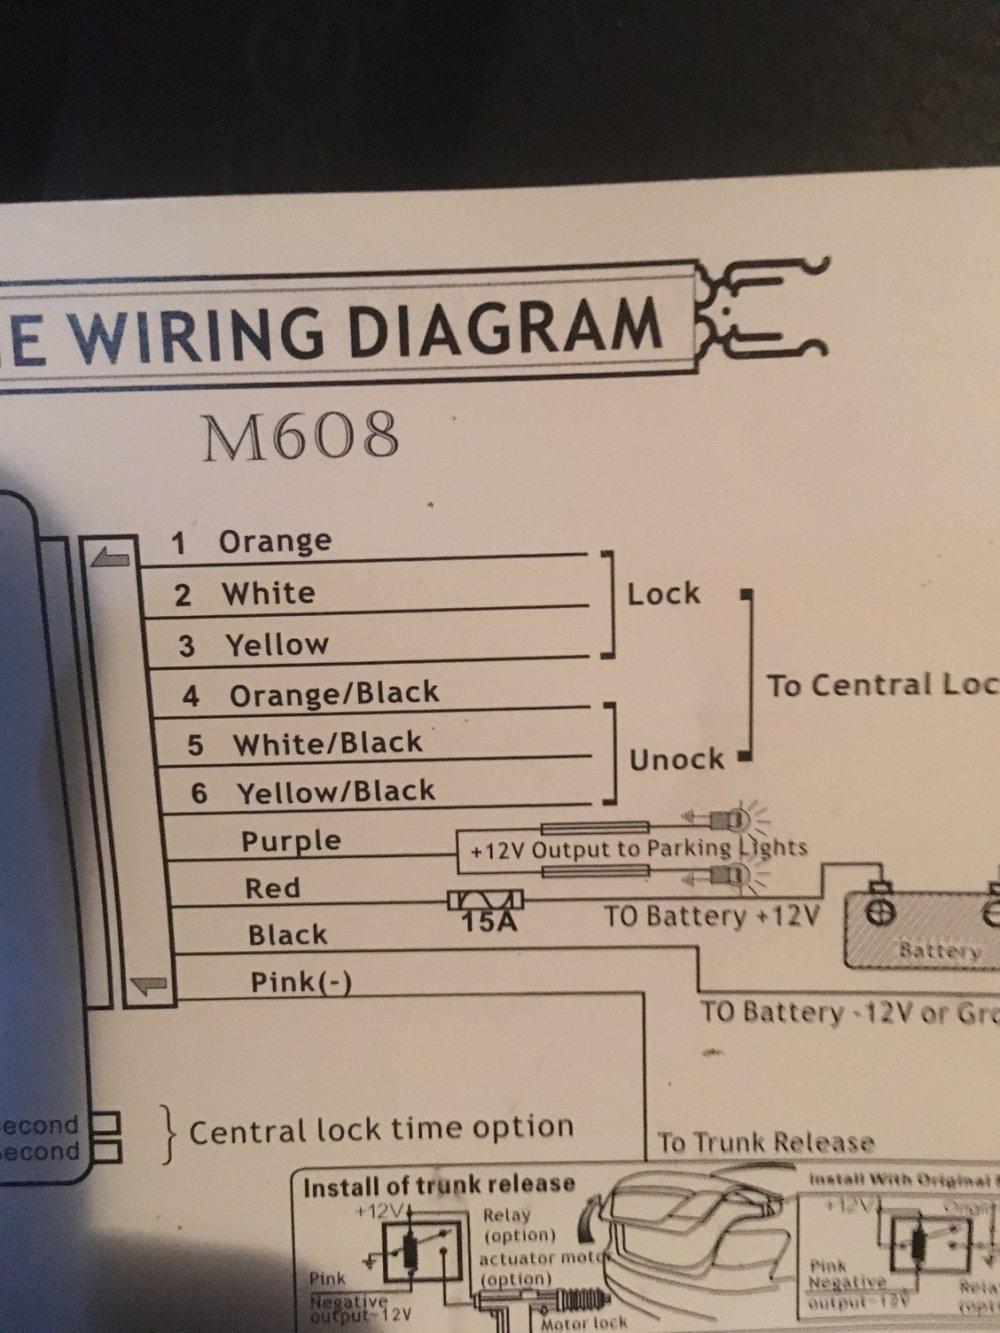 medium resolution of remote entry wiring diagram wiring diagram technic mfk 285 keyless entry system wiring diagram keyless entry wiring diagram